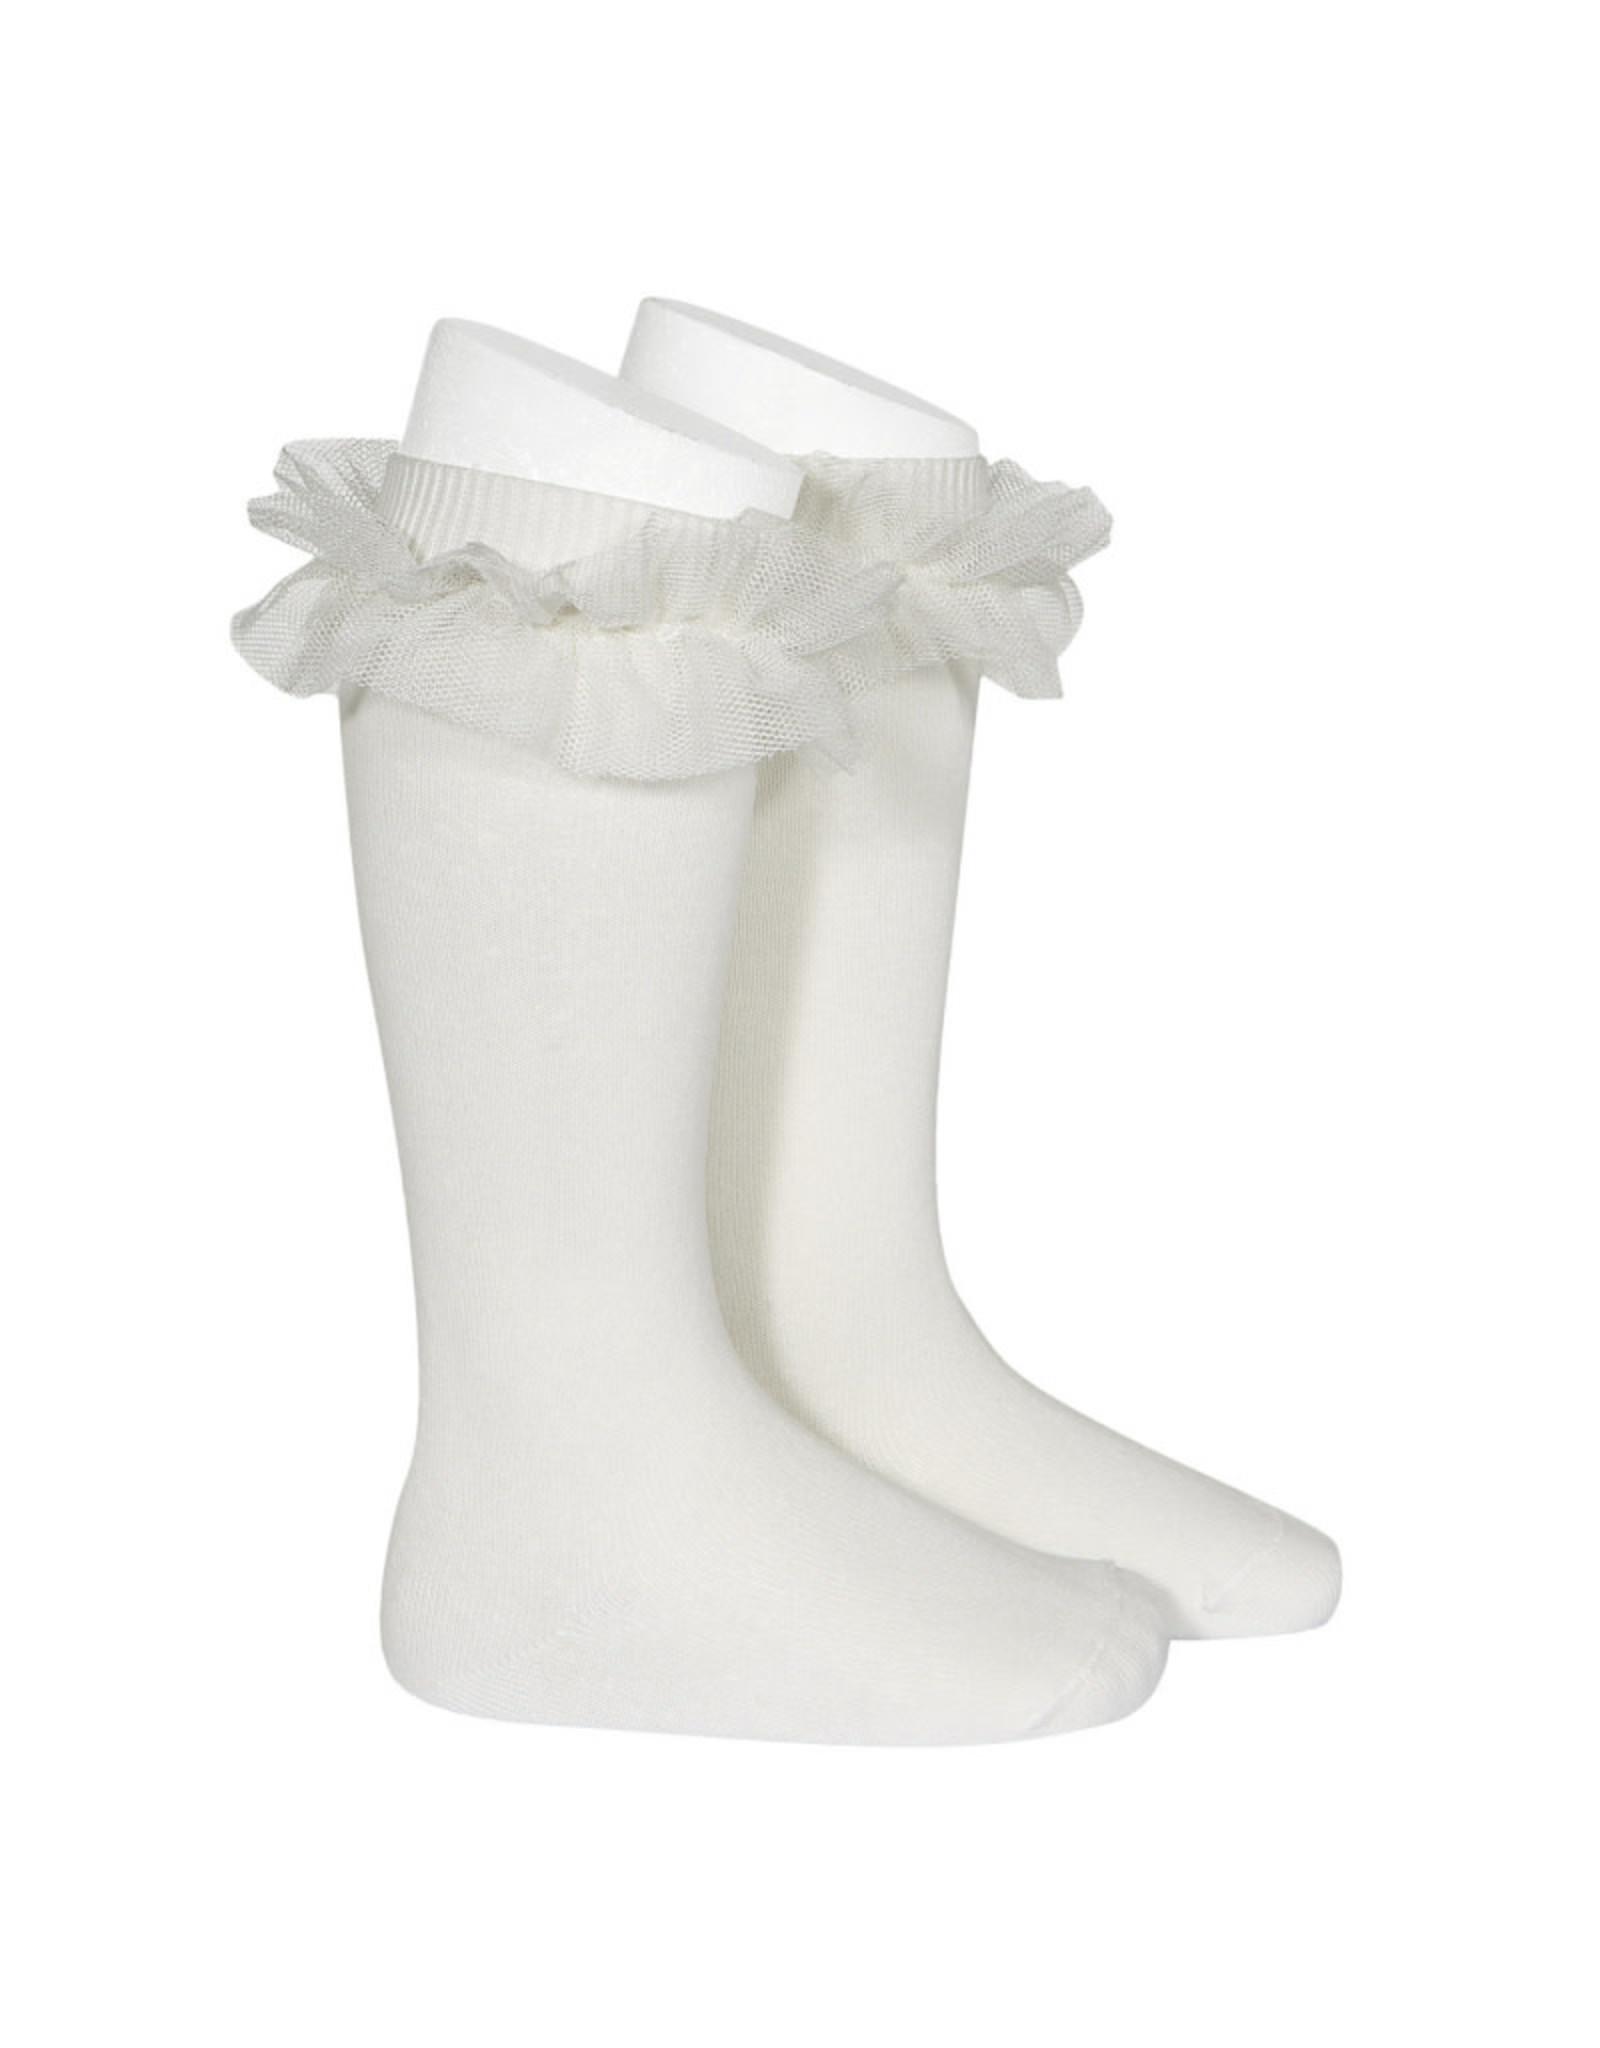 CONDOR Cream Tulle Ruffle Knee Socks